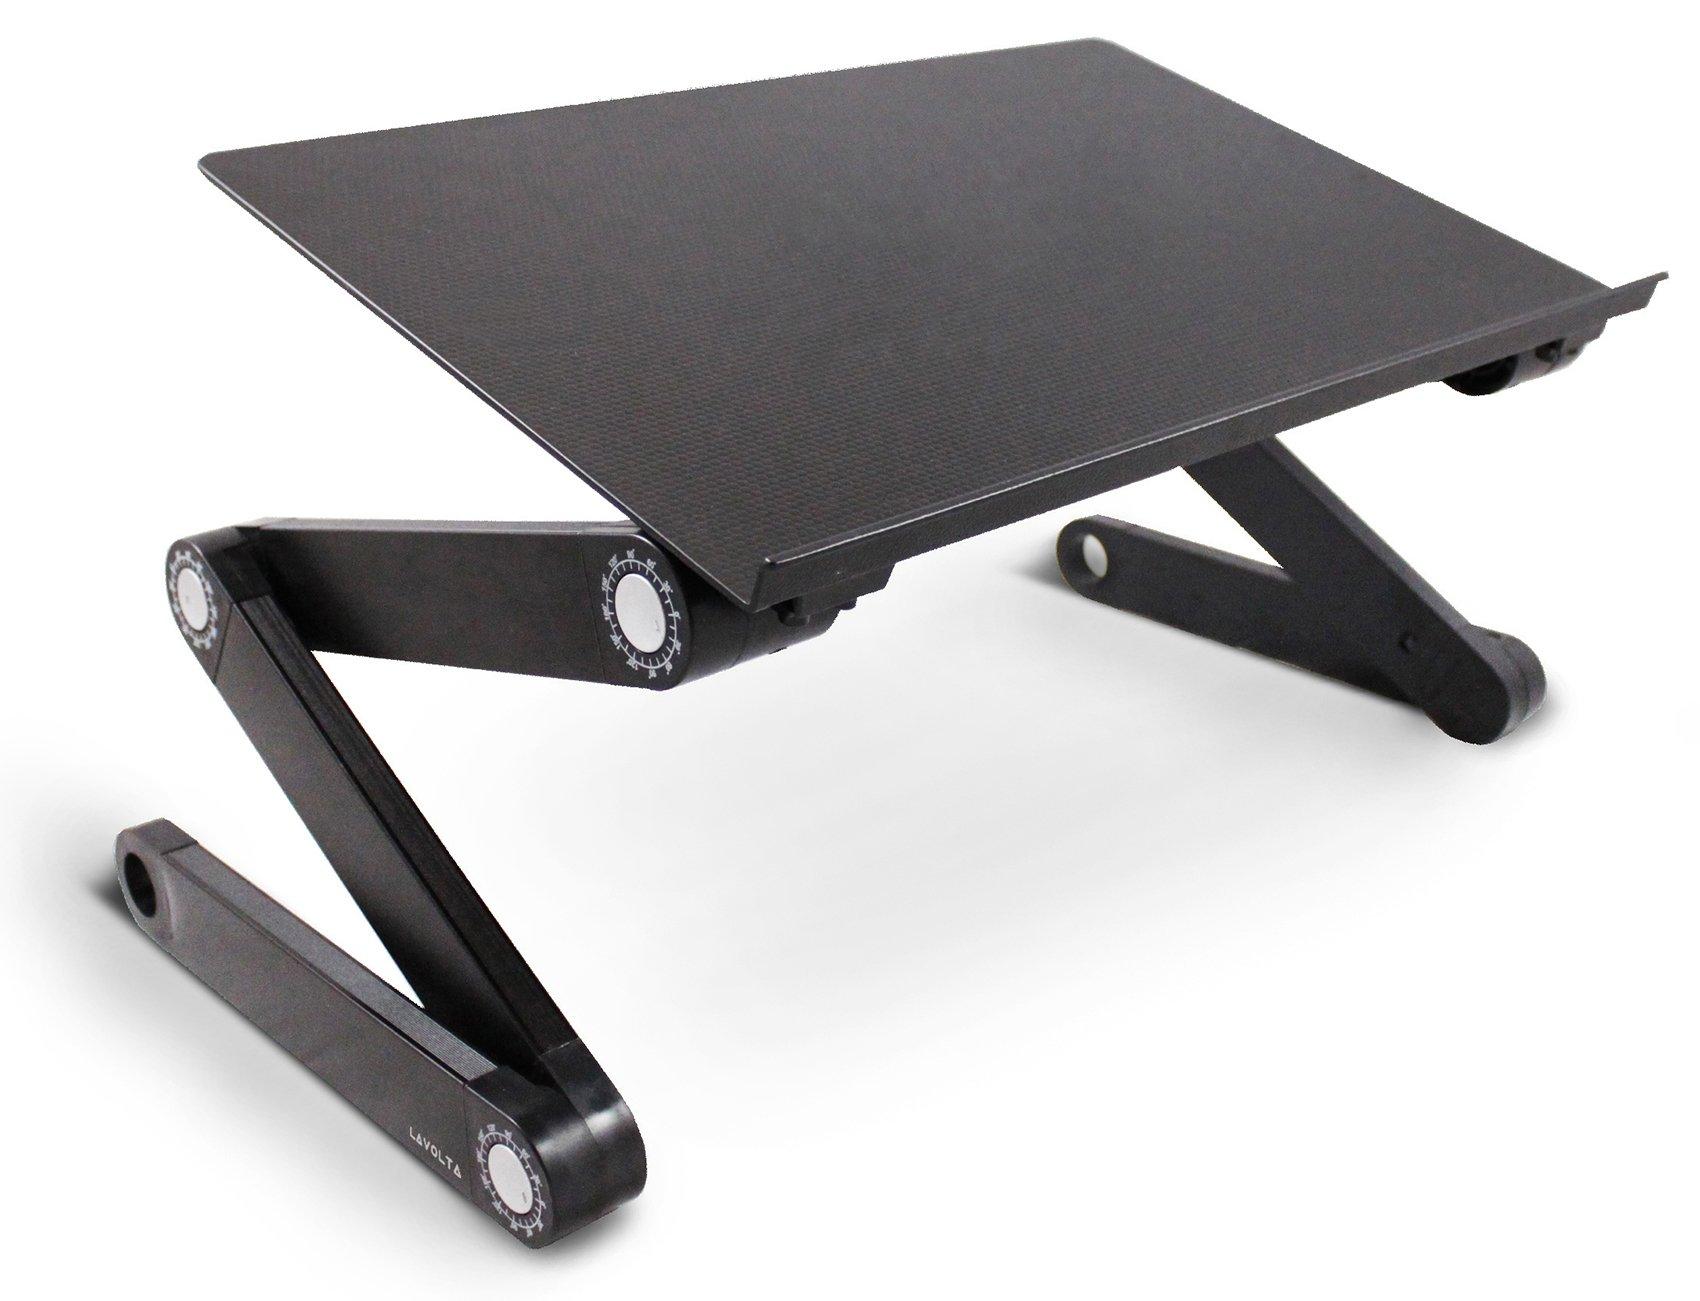 Lavolta Ergonomic Laptop Table Desk Breakfast Bed Tray Book Holder